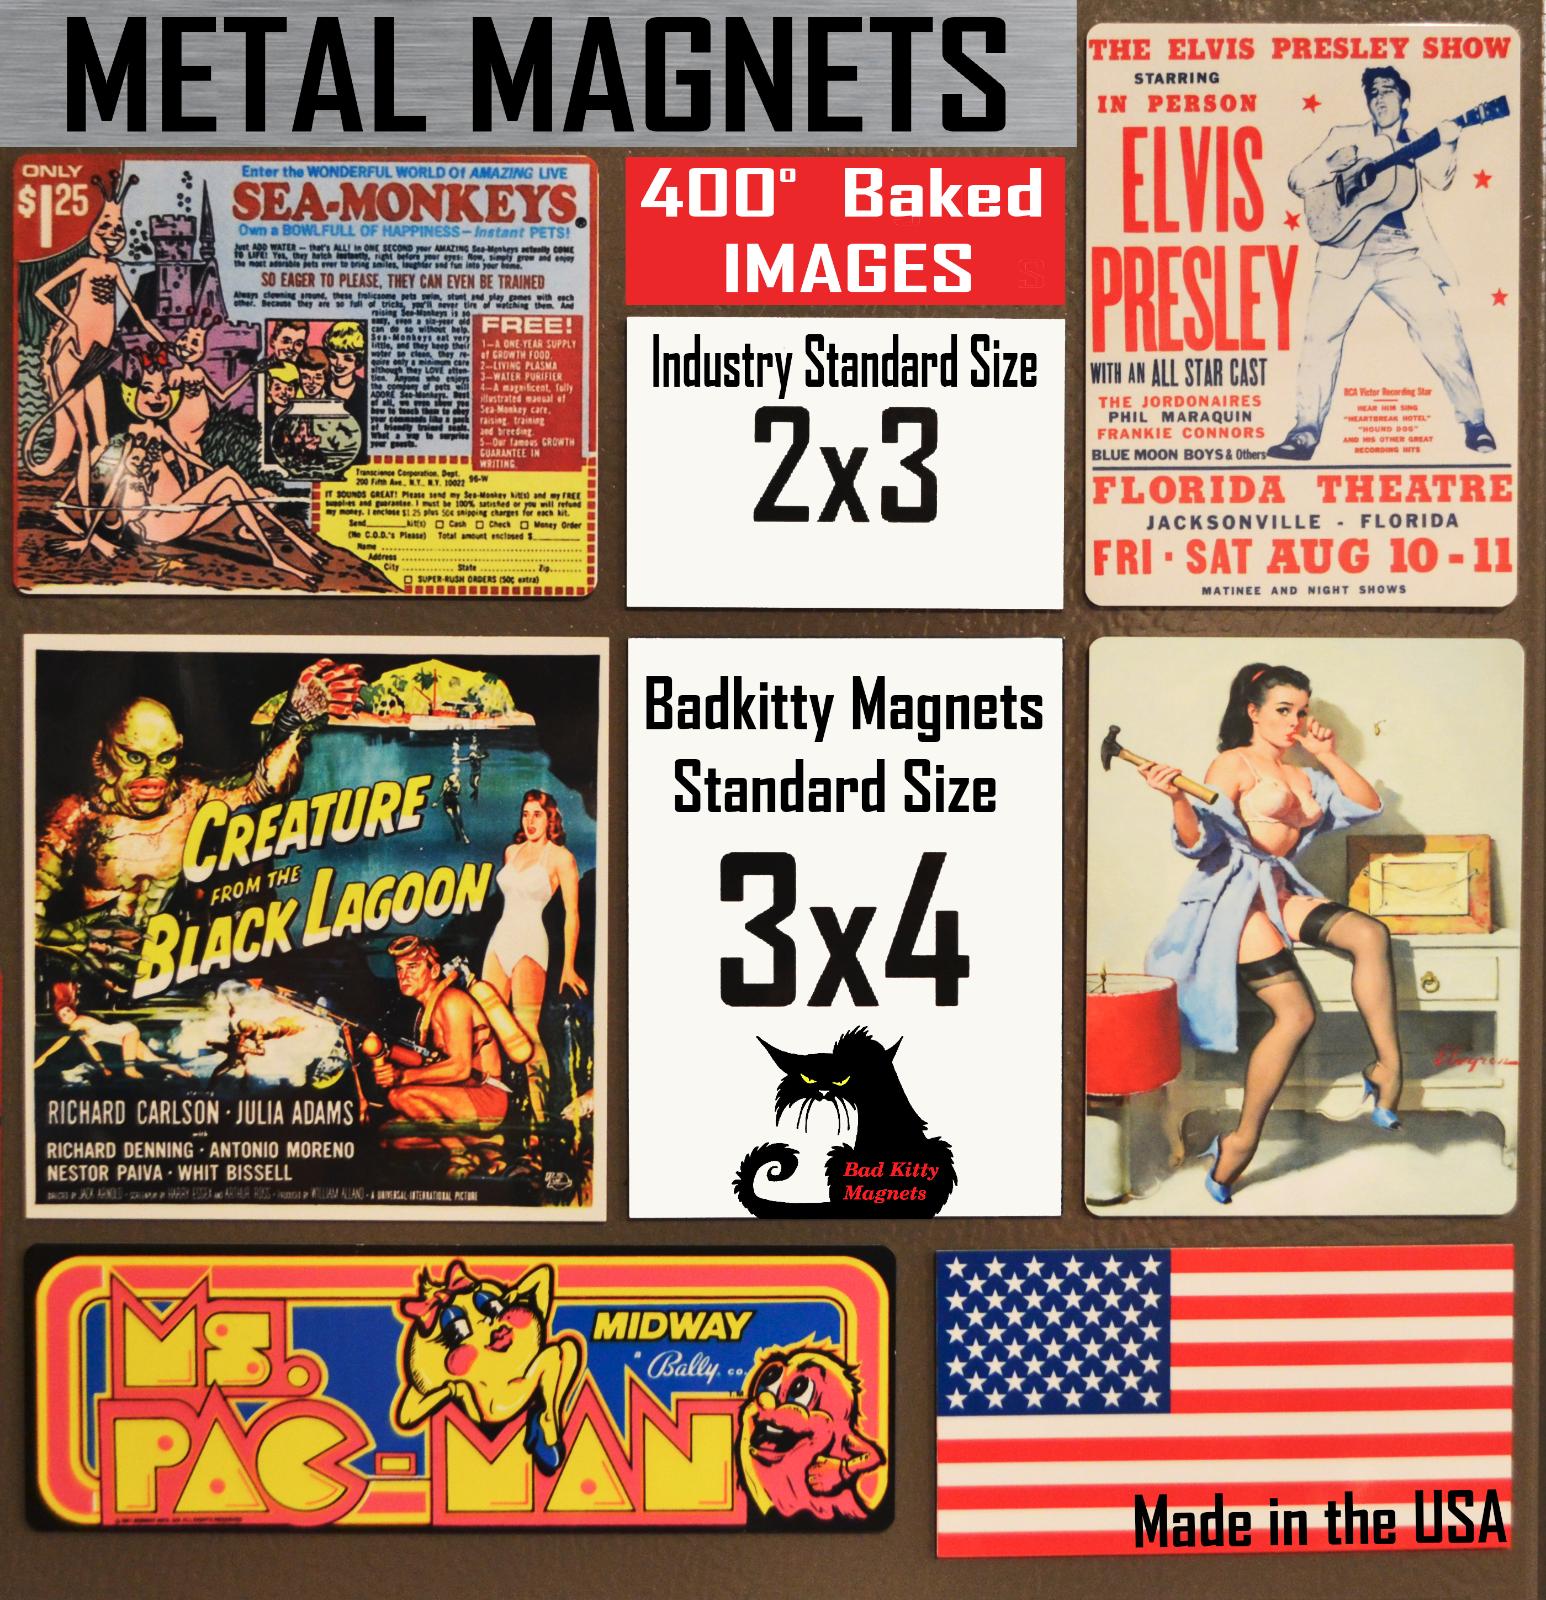 Betsy Ross American Flag  High Quality Metal Fridge Magnet 3x4.5 8954 2